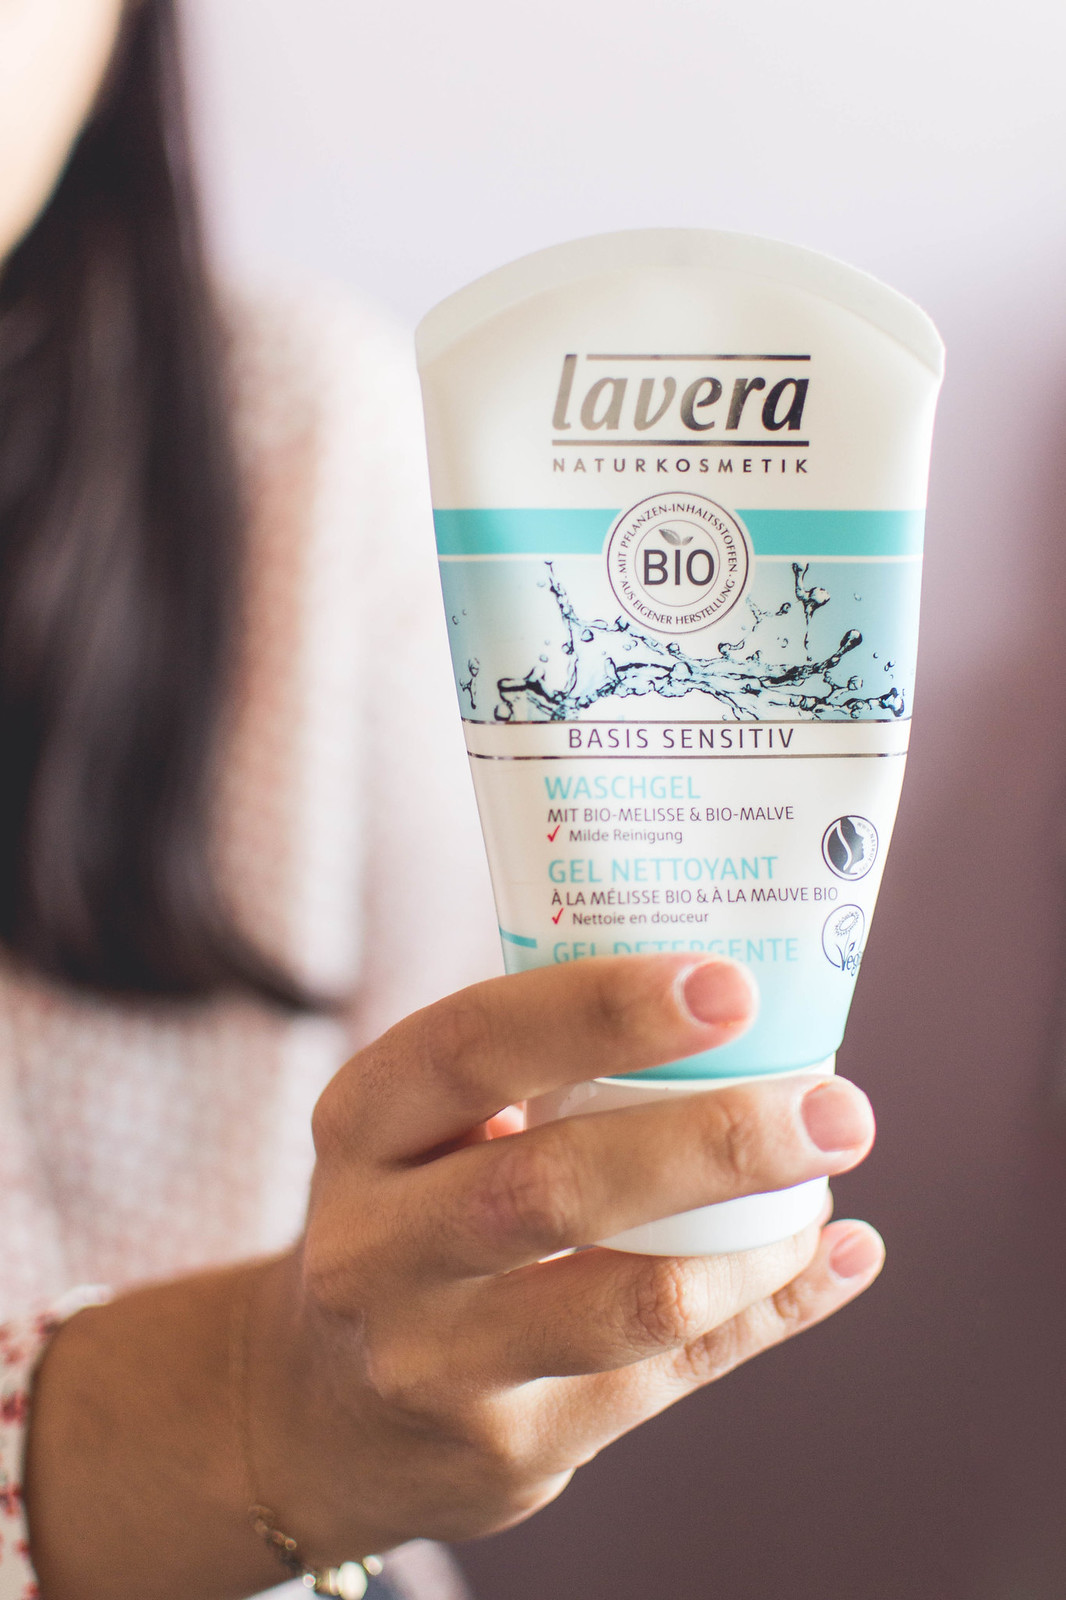 Lavera Basis Sensitive Cleansing Gel